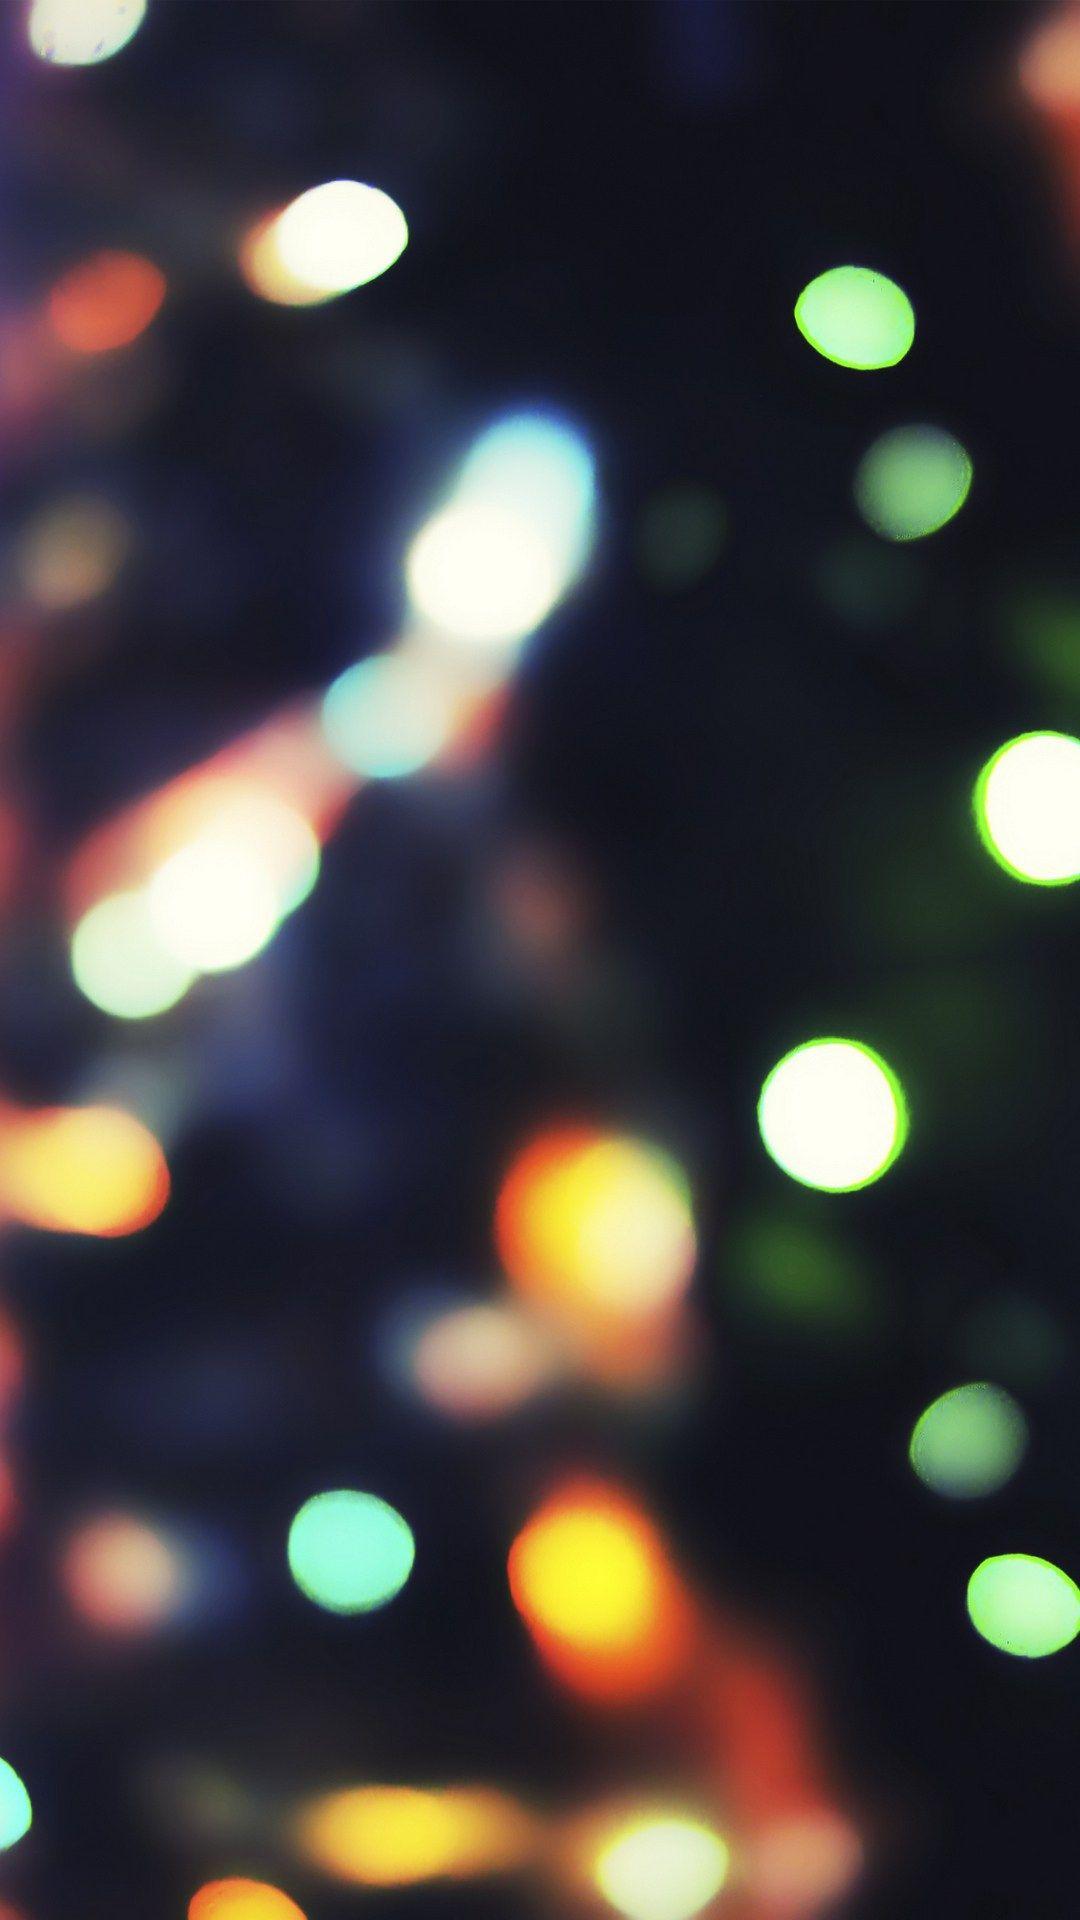 Neon Light Bokeh IPhone 7 Wallpaper